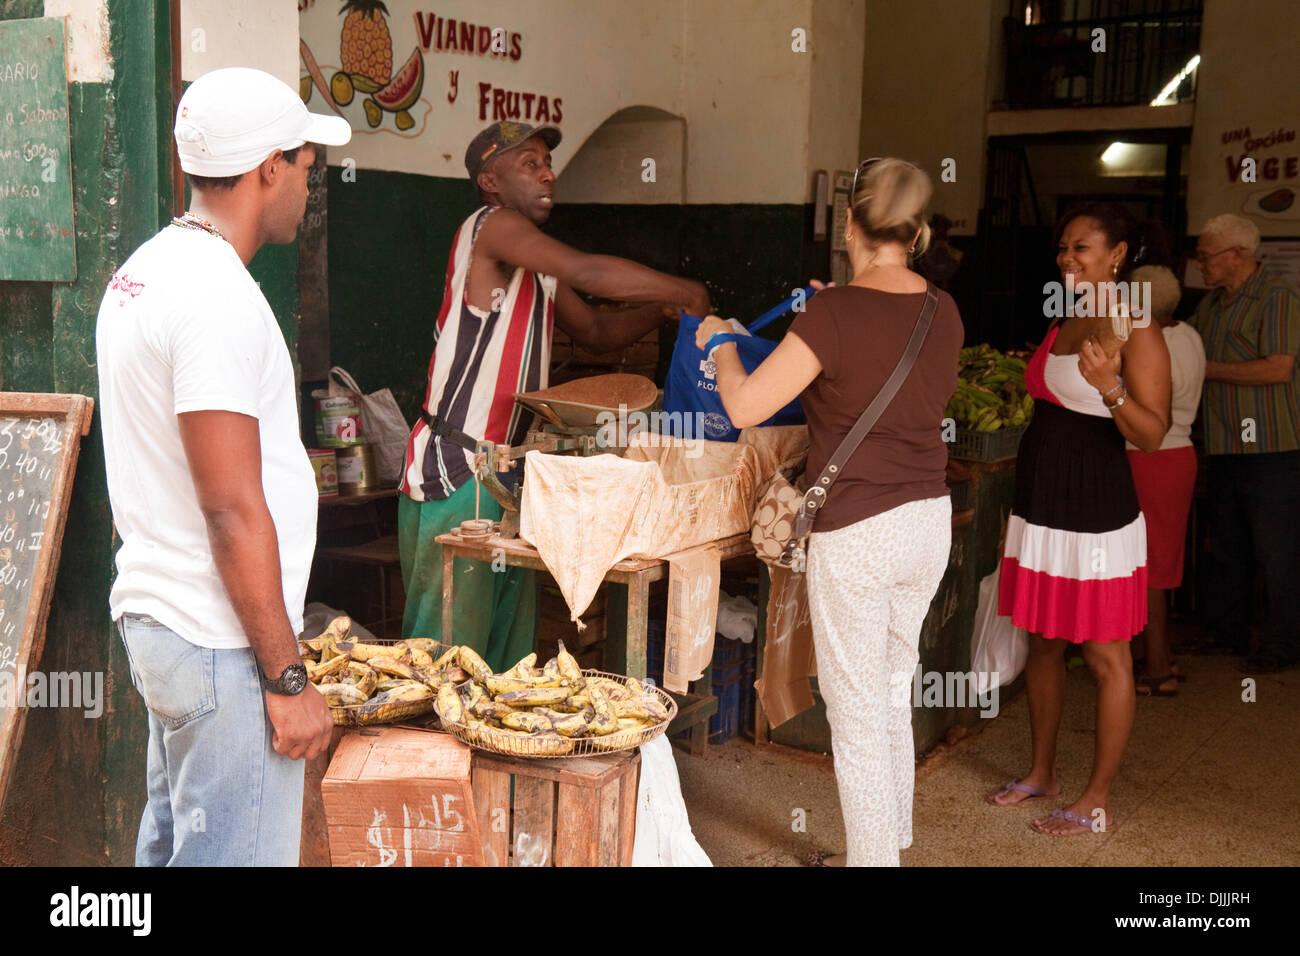 Cuba people - People buying fruit at the local market, Brasil St, Havana, Cuba, Caribbean, Latin America - Stock Image